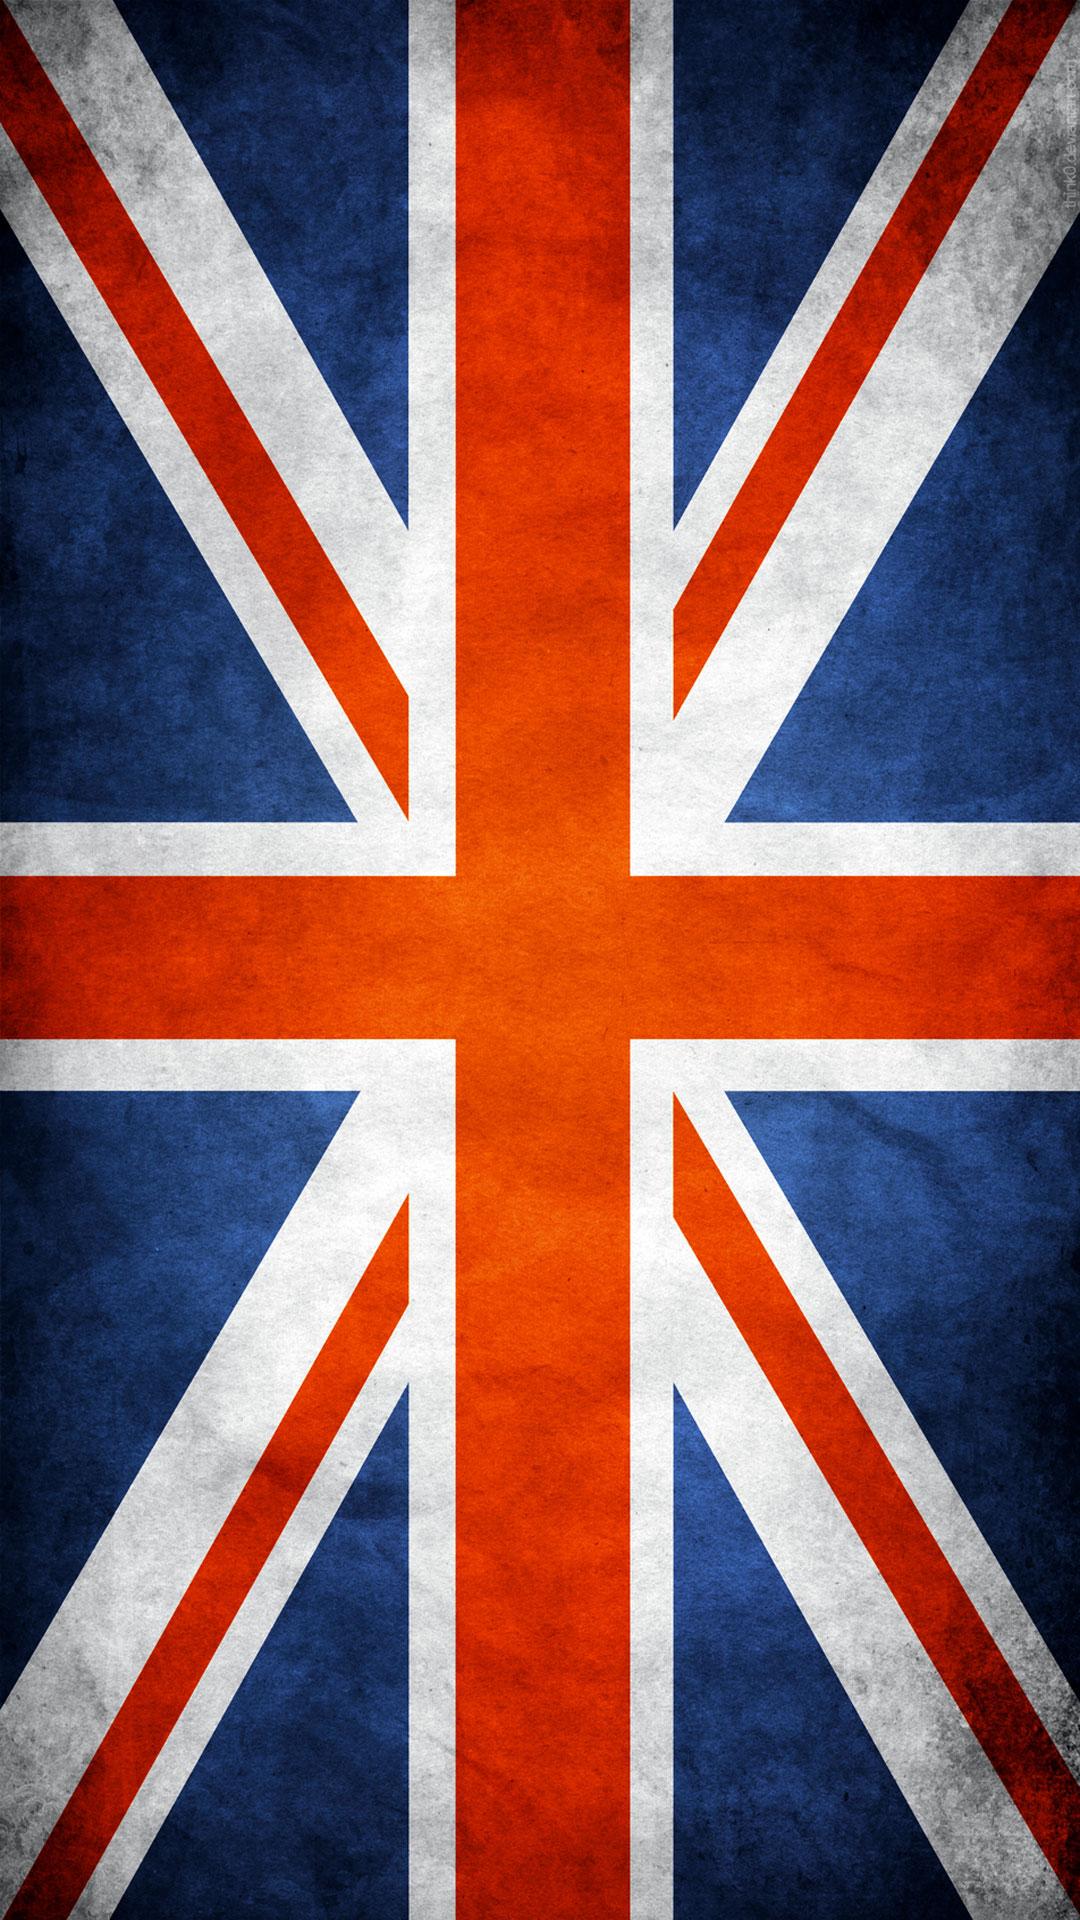 British Flag Wallpaper For Iphone wwwgalleryhipcom 1080x1920